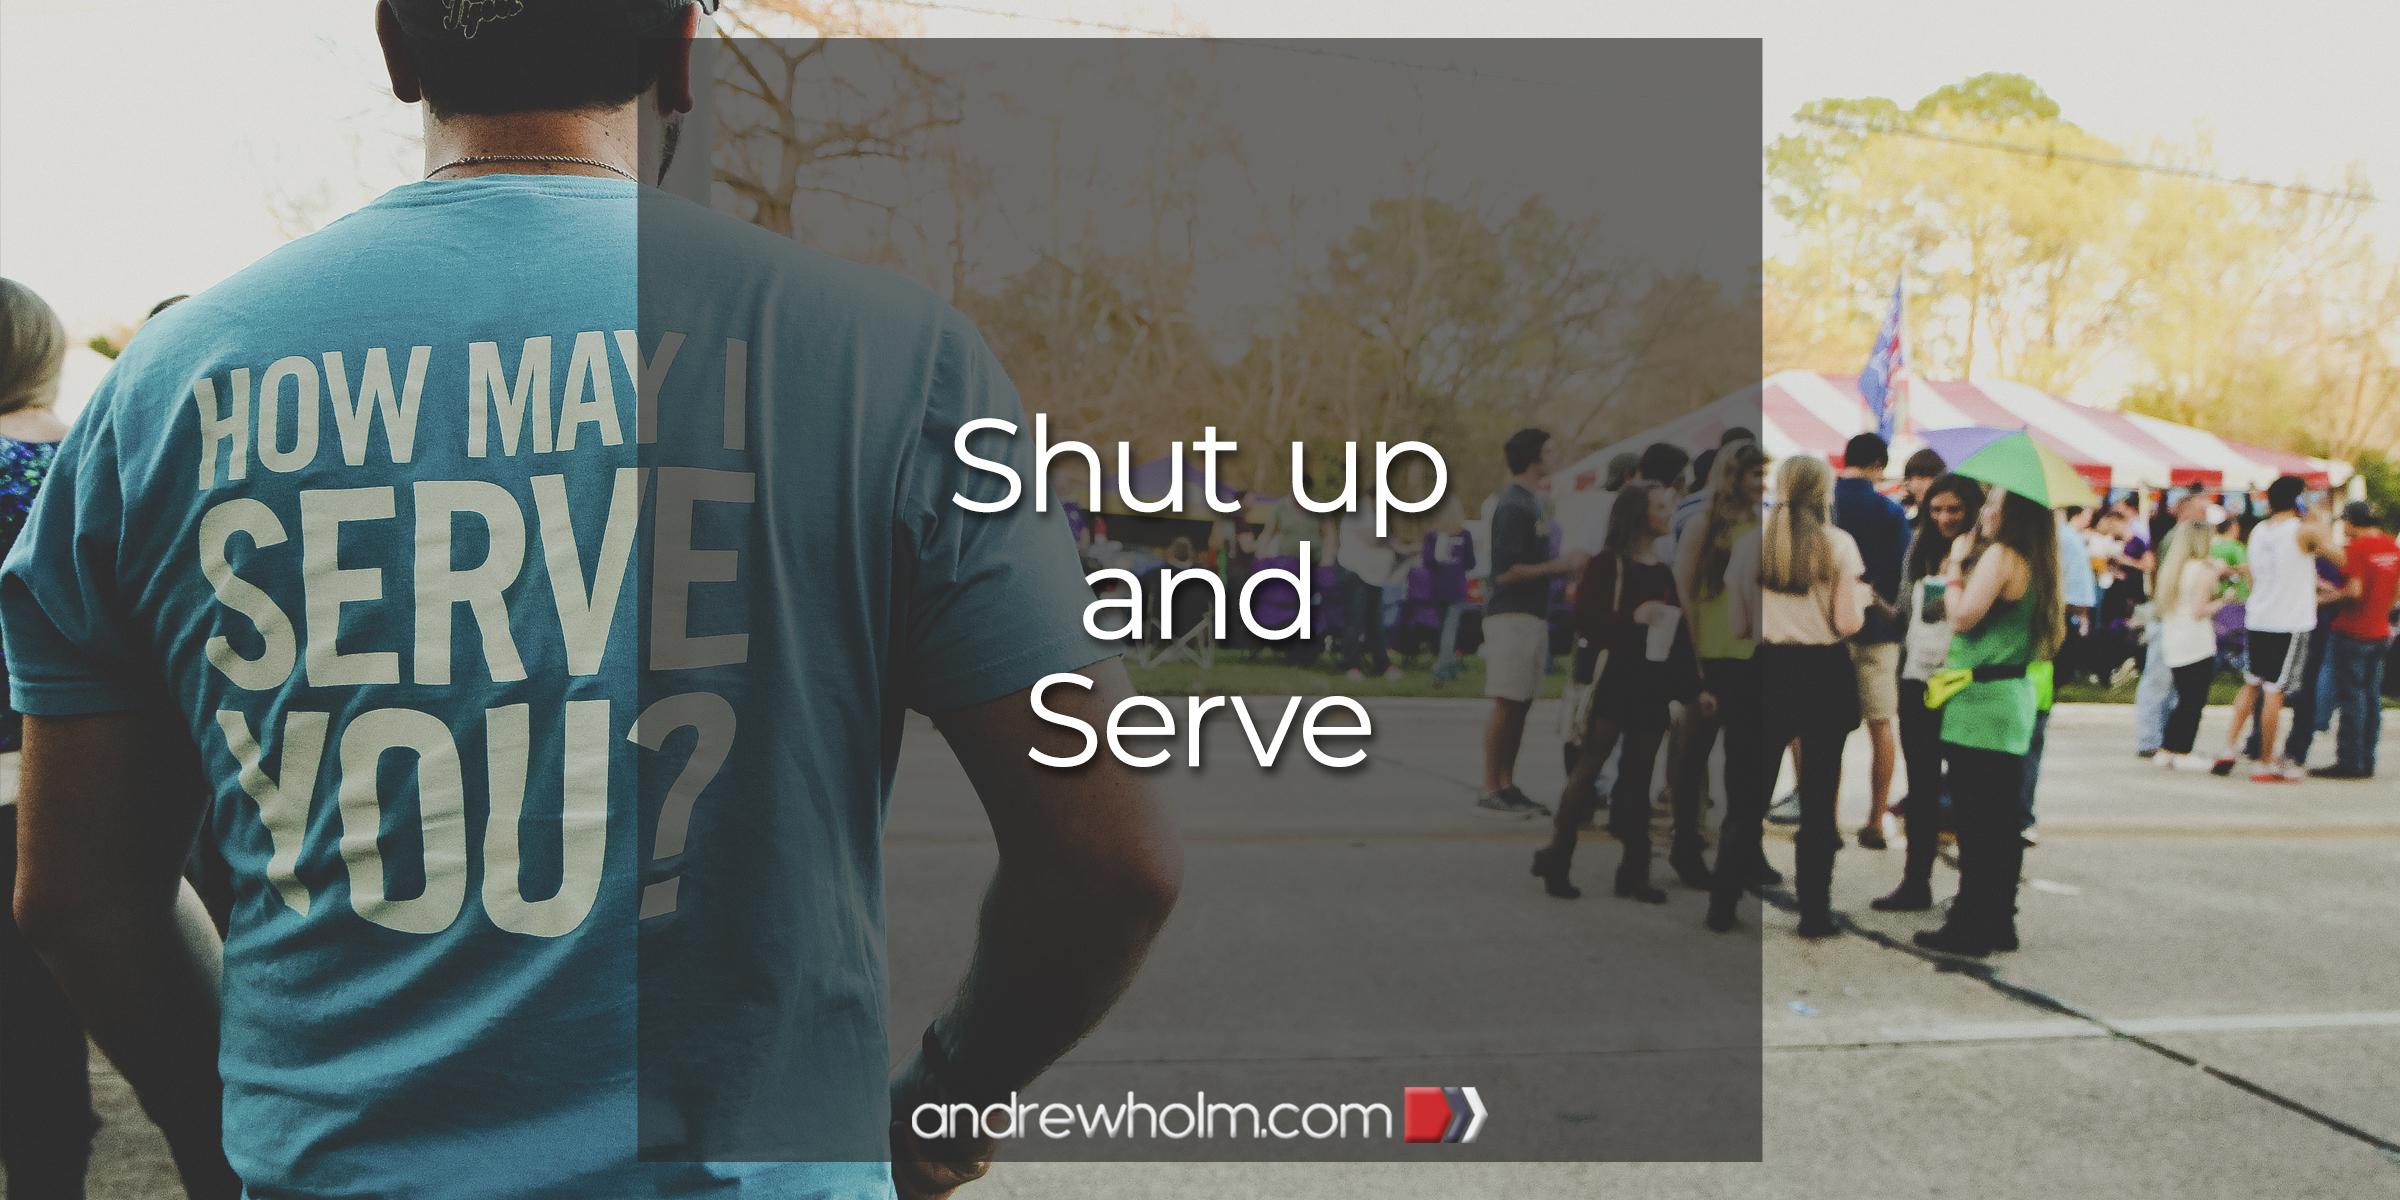 Shut up and Serve